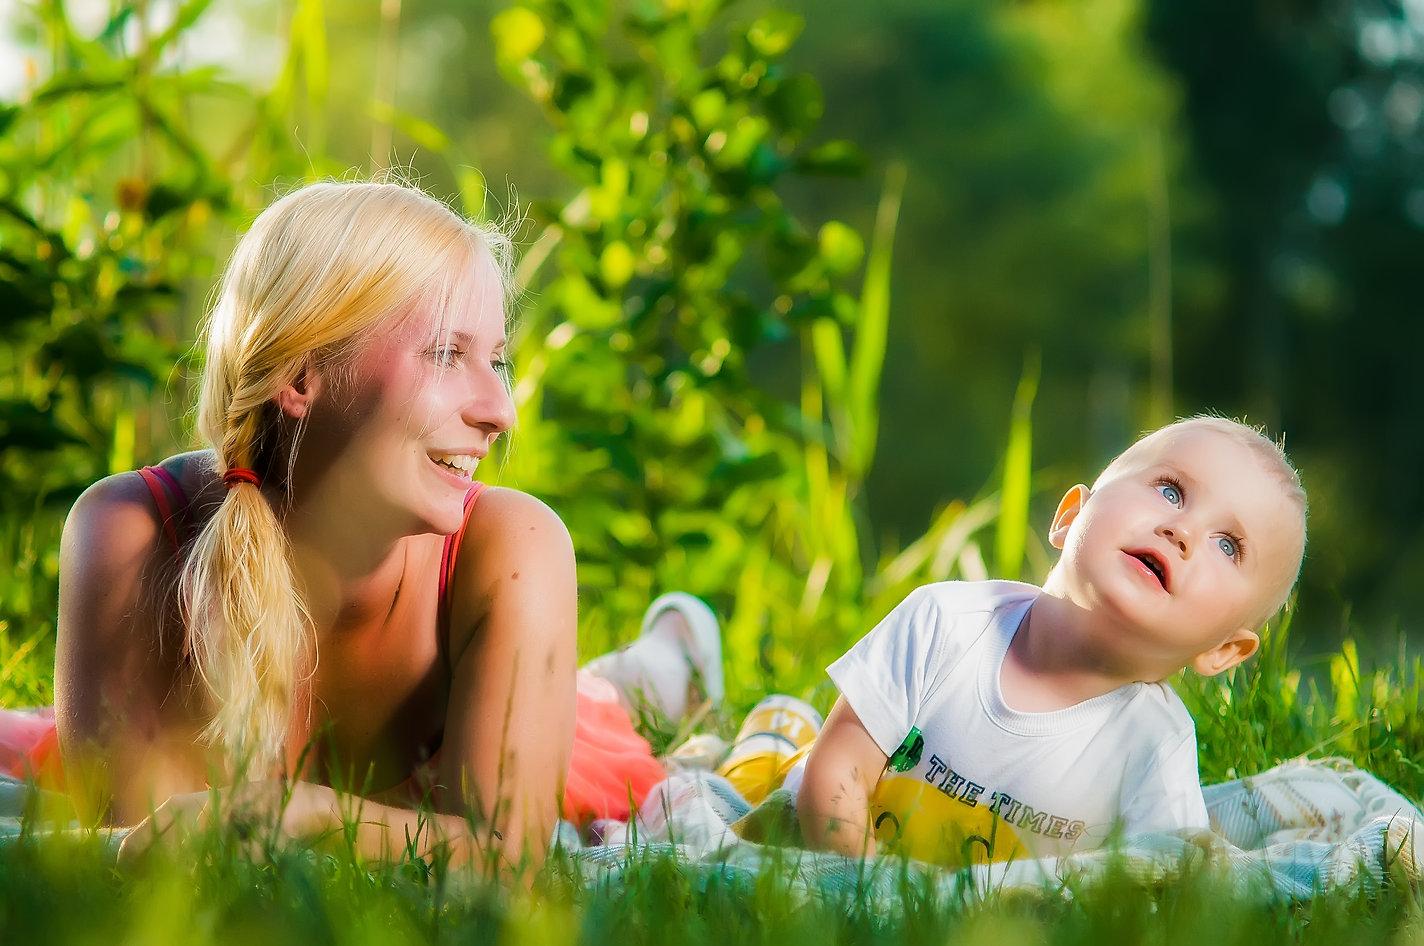 wwwfotomeliacom-images-gratuites-84.jpg